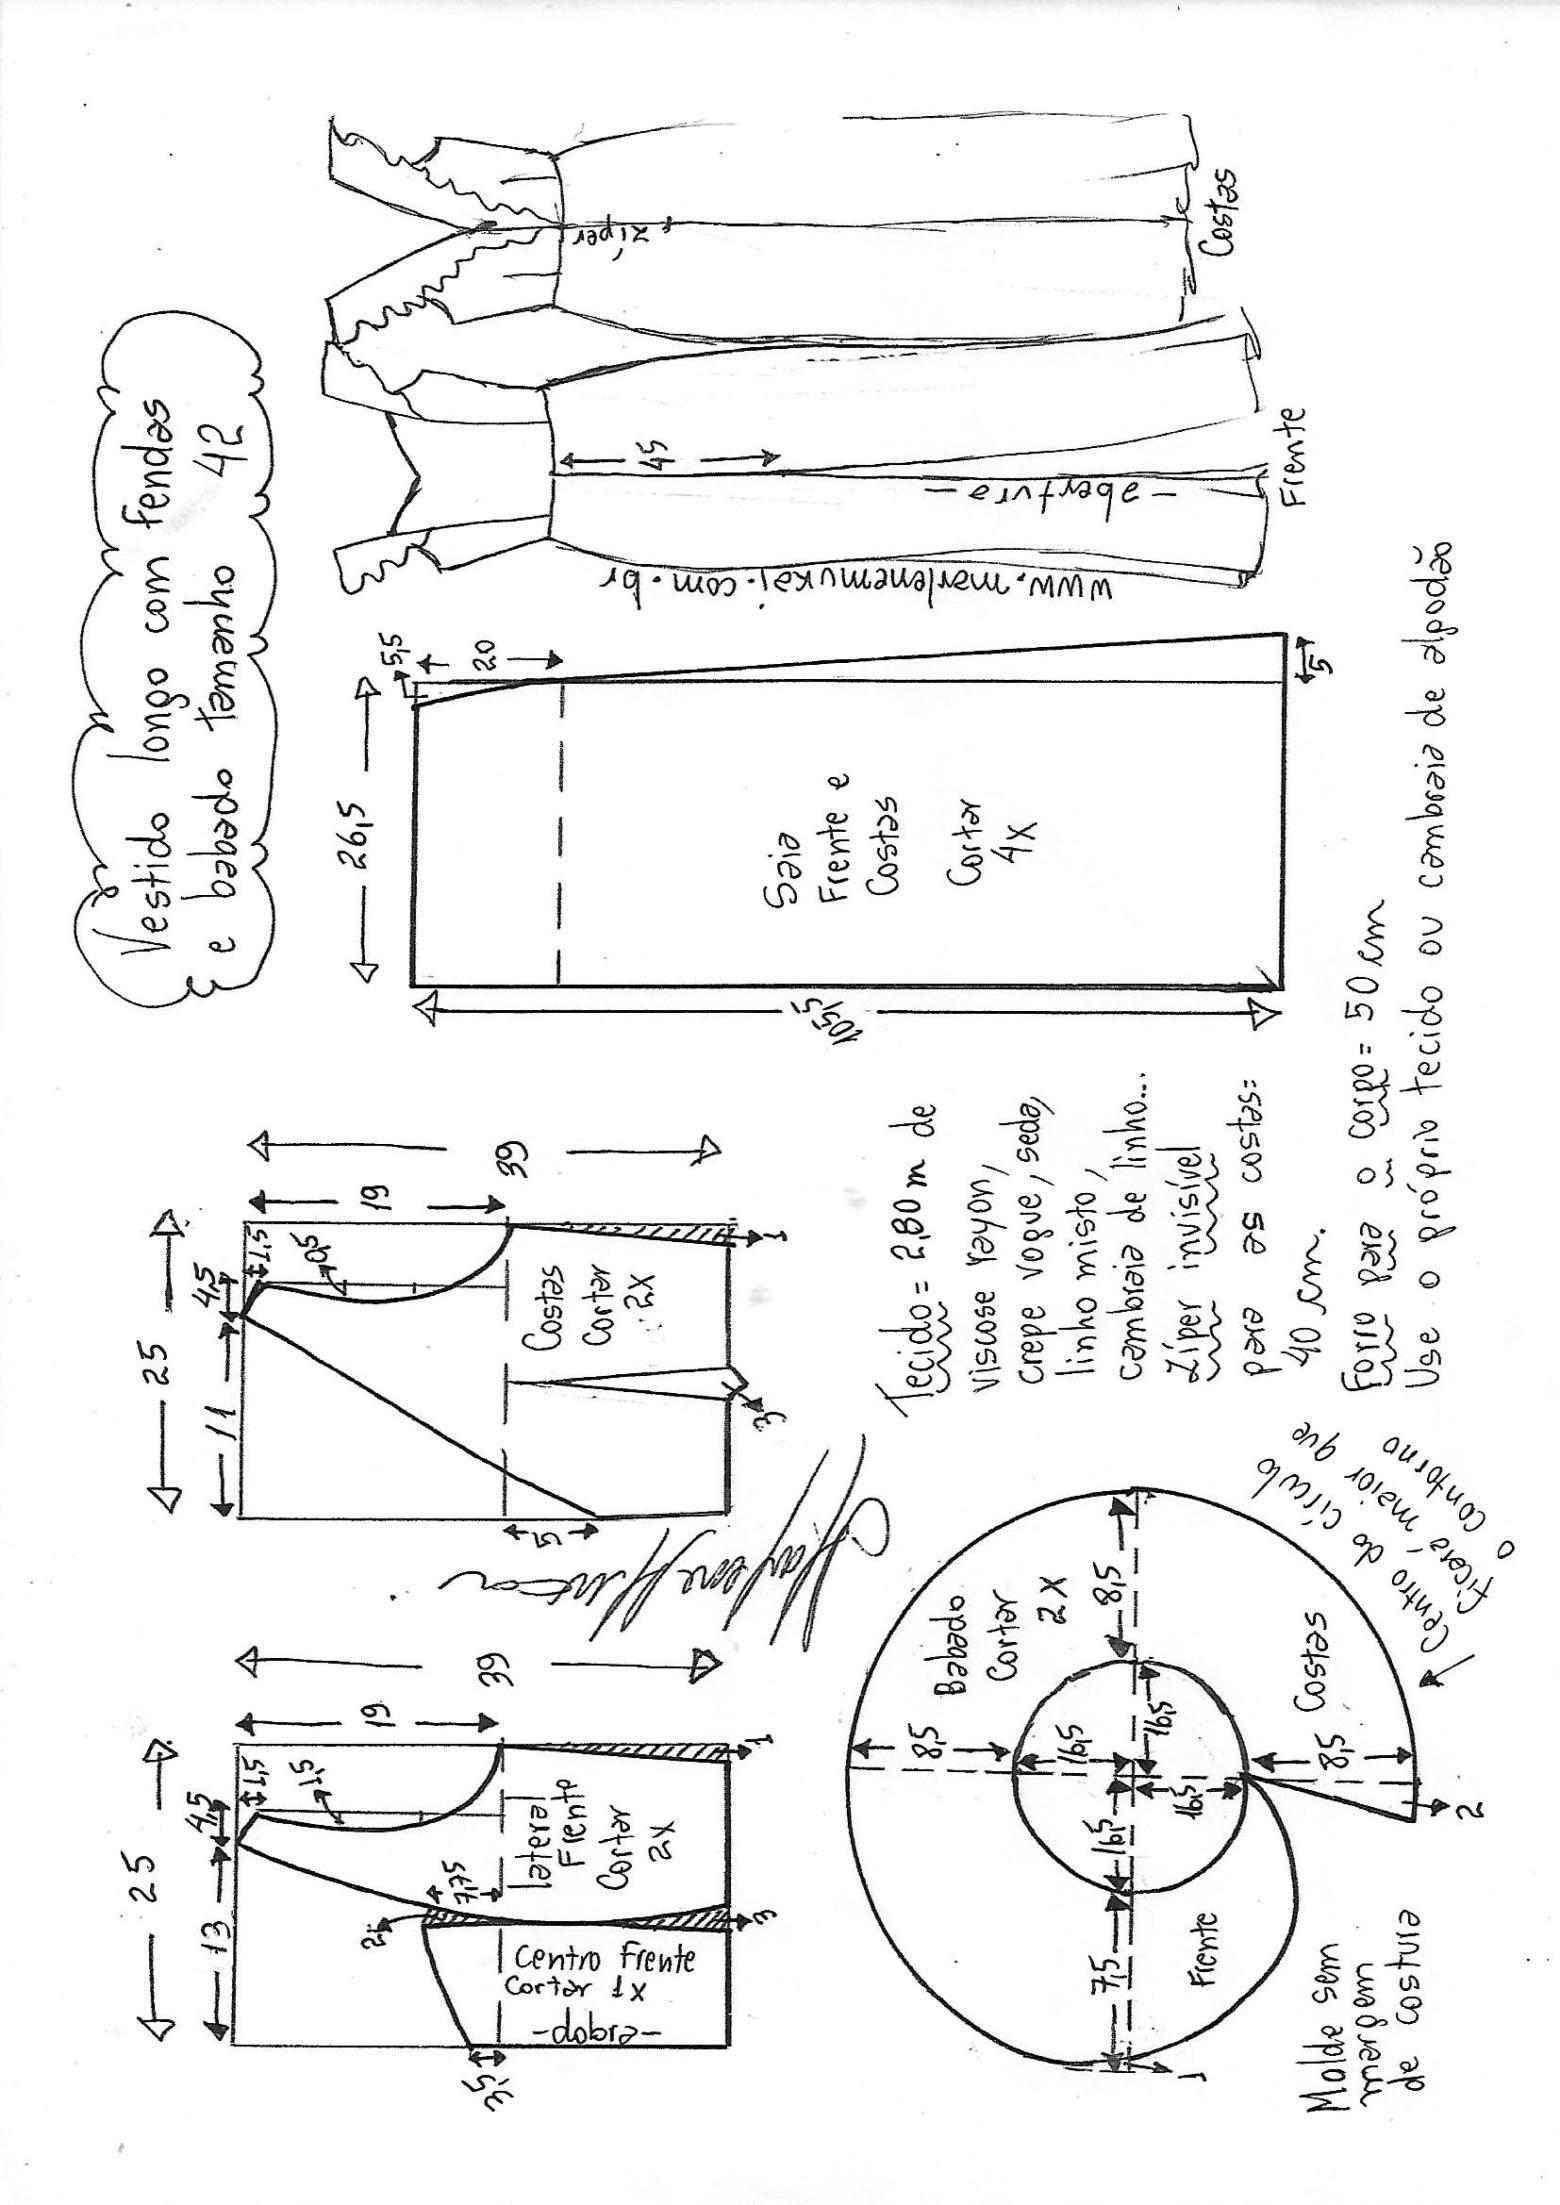 Vestido peplum com manga flare | Sp3 | Pinterest | Molde, Recortes y ...